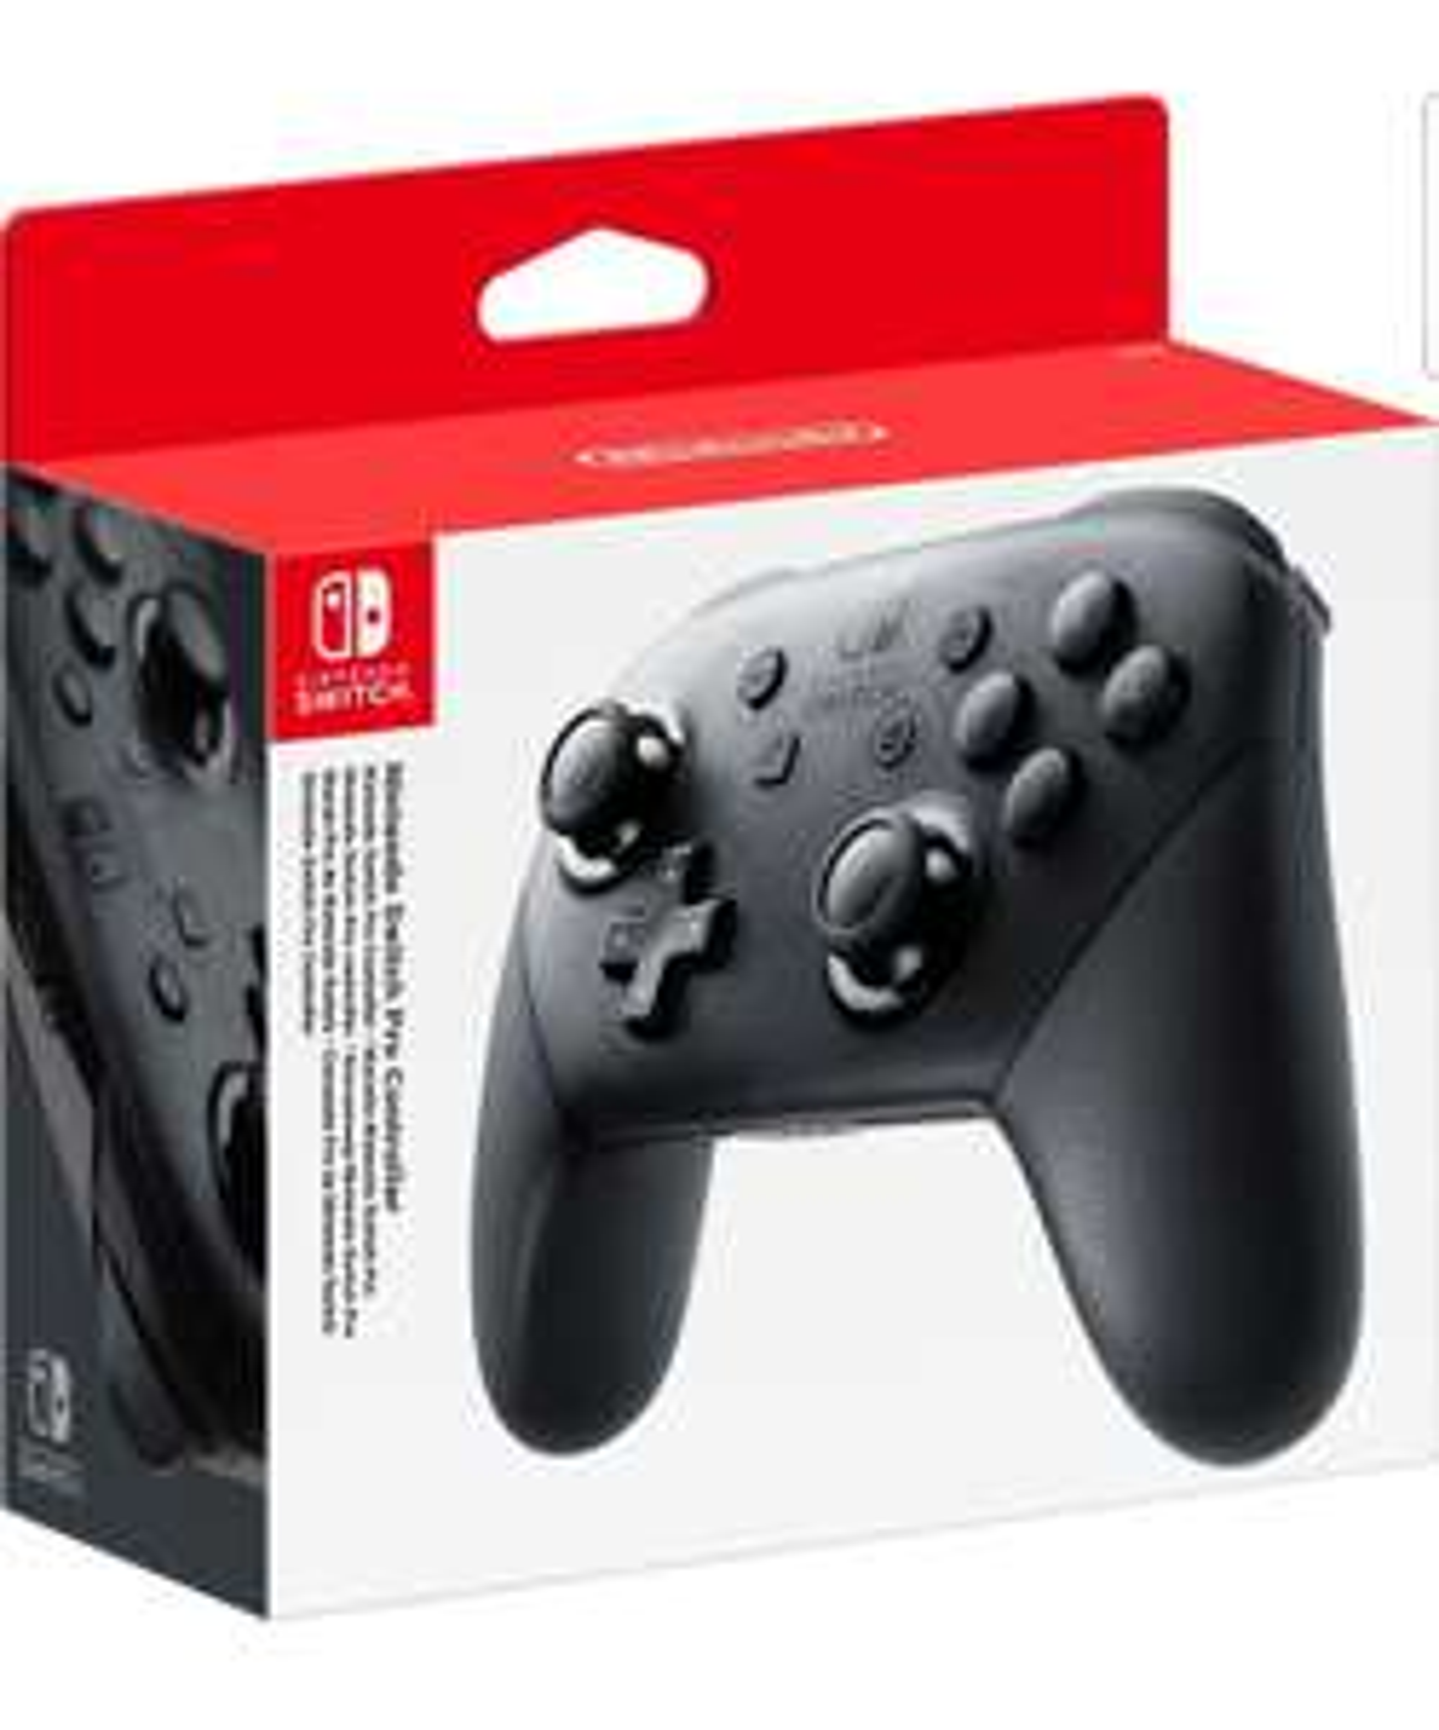 Nintendo Switch Controller »Pro«  (Universal-Versand in Paketshop)